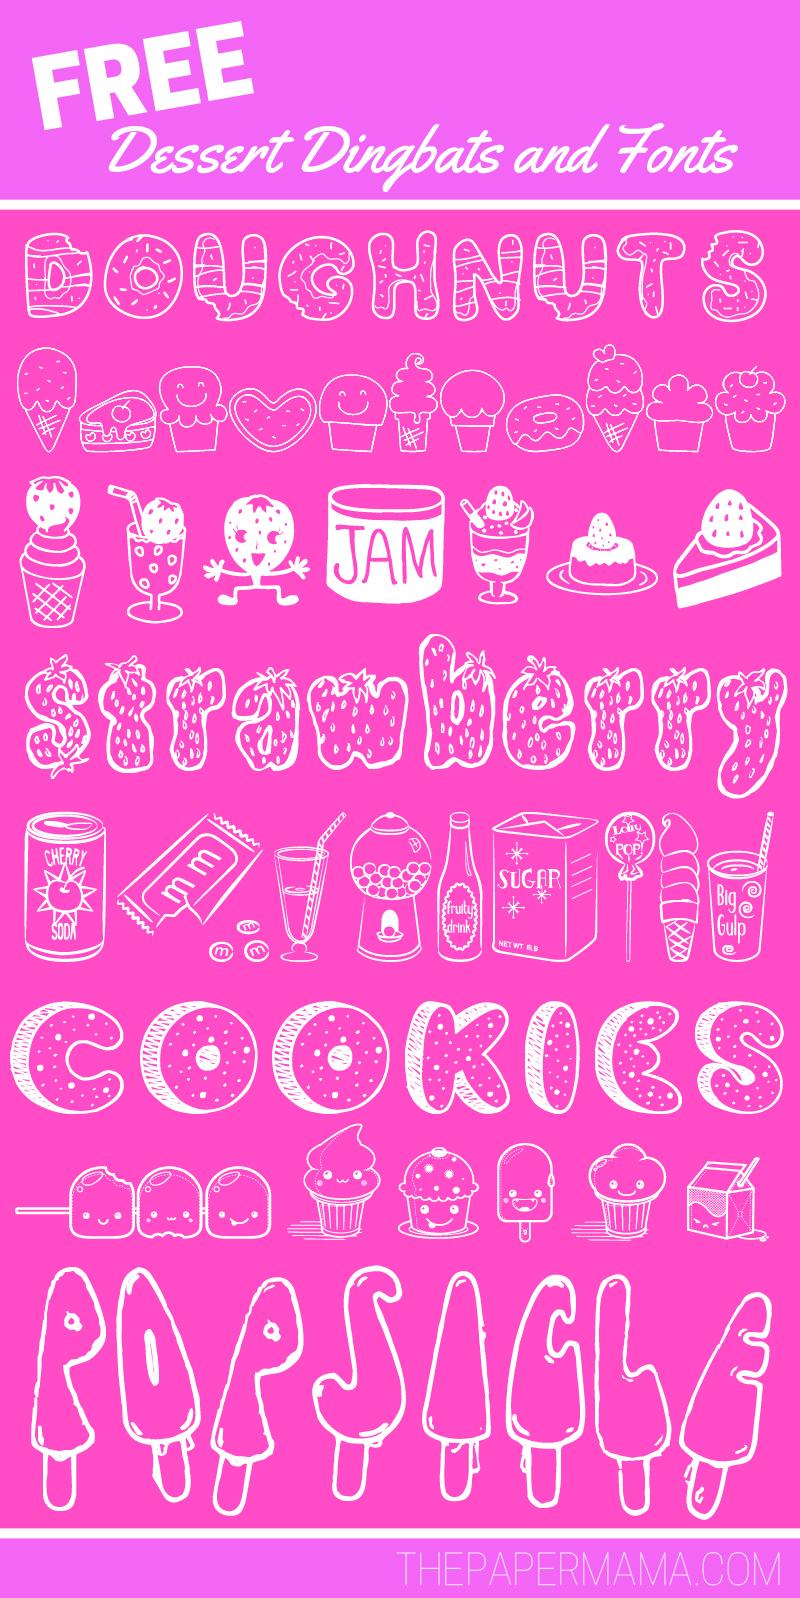 My Favorite Free Dessert Dingbats and Fonts - THEPAPERMAMA.COM